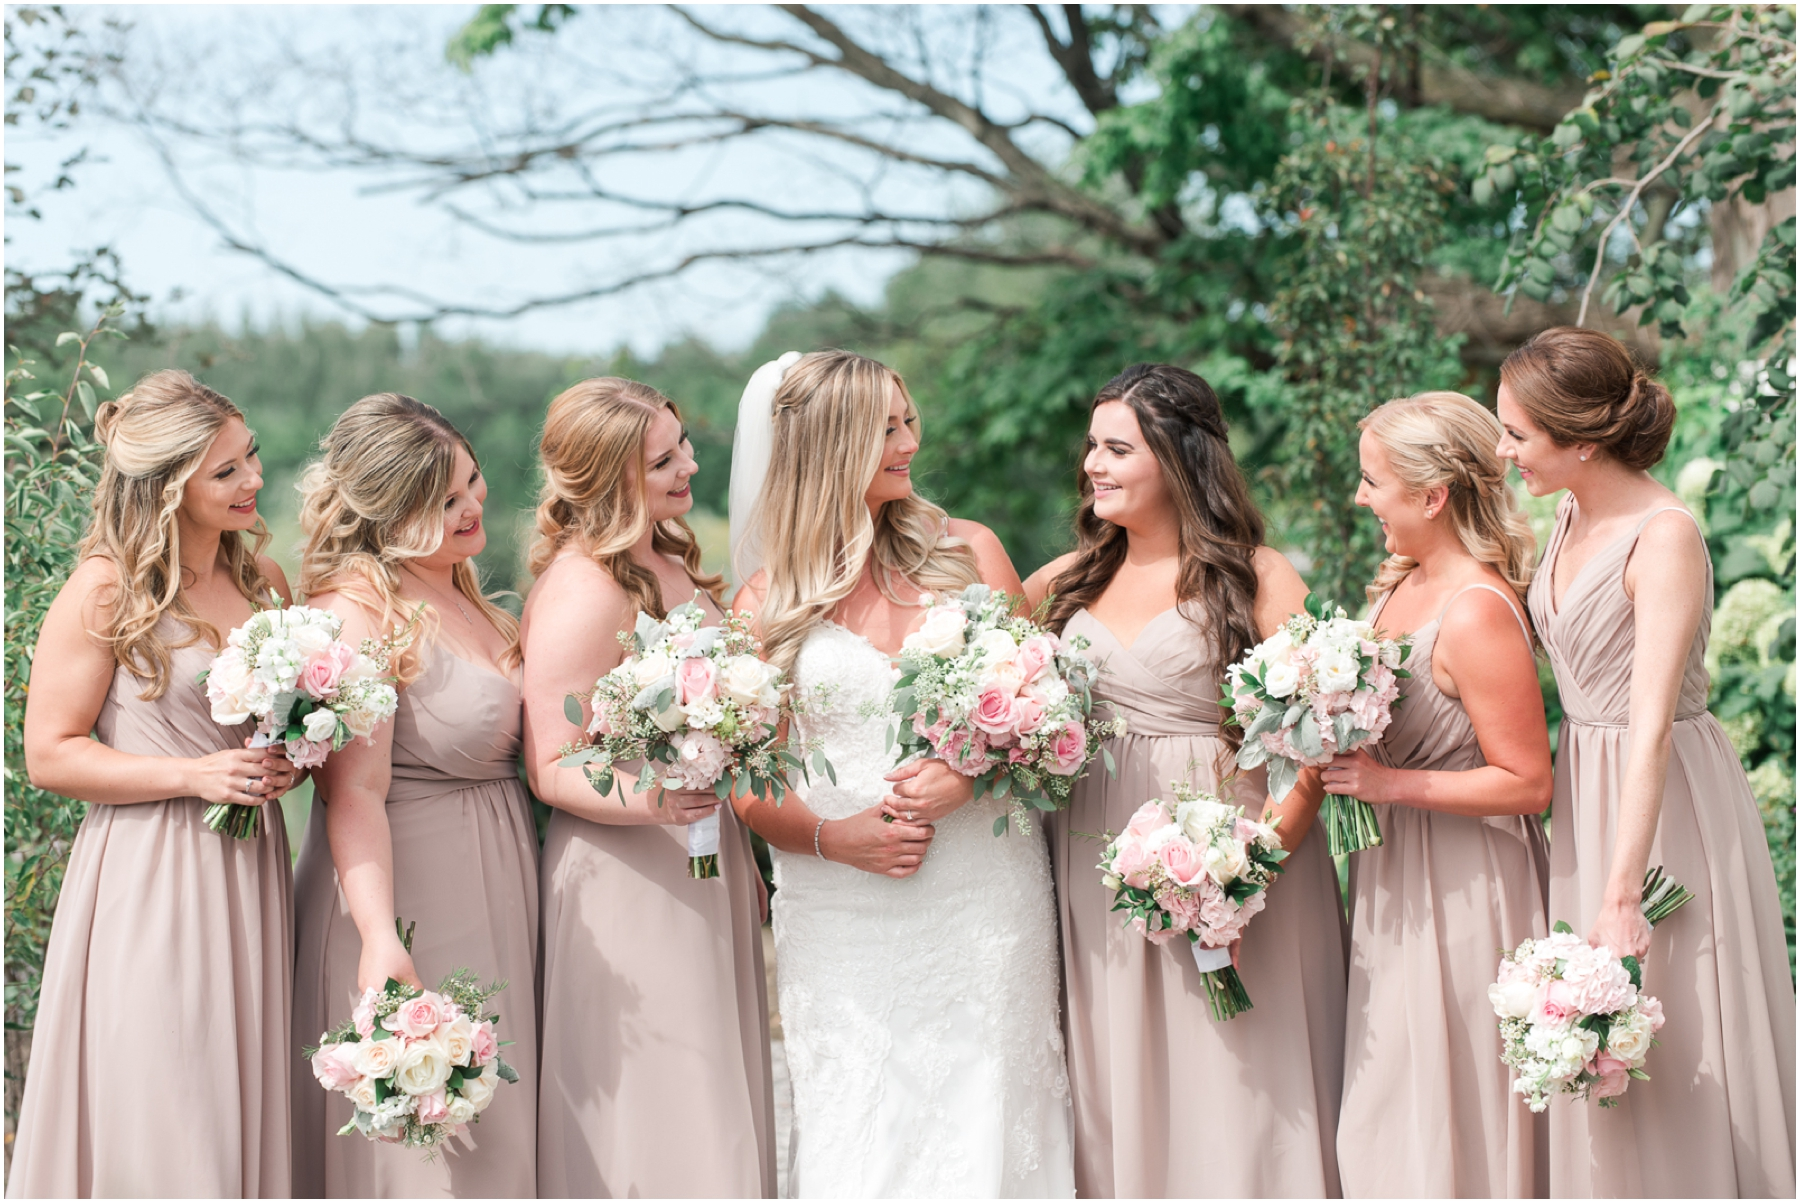 Bloom Field Gardens Wedding Precious Photography Katherine & Chris_019